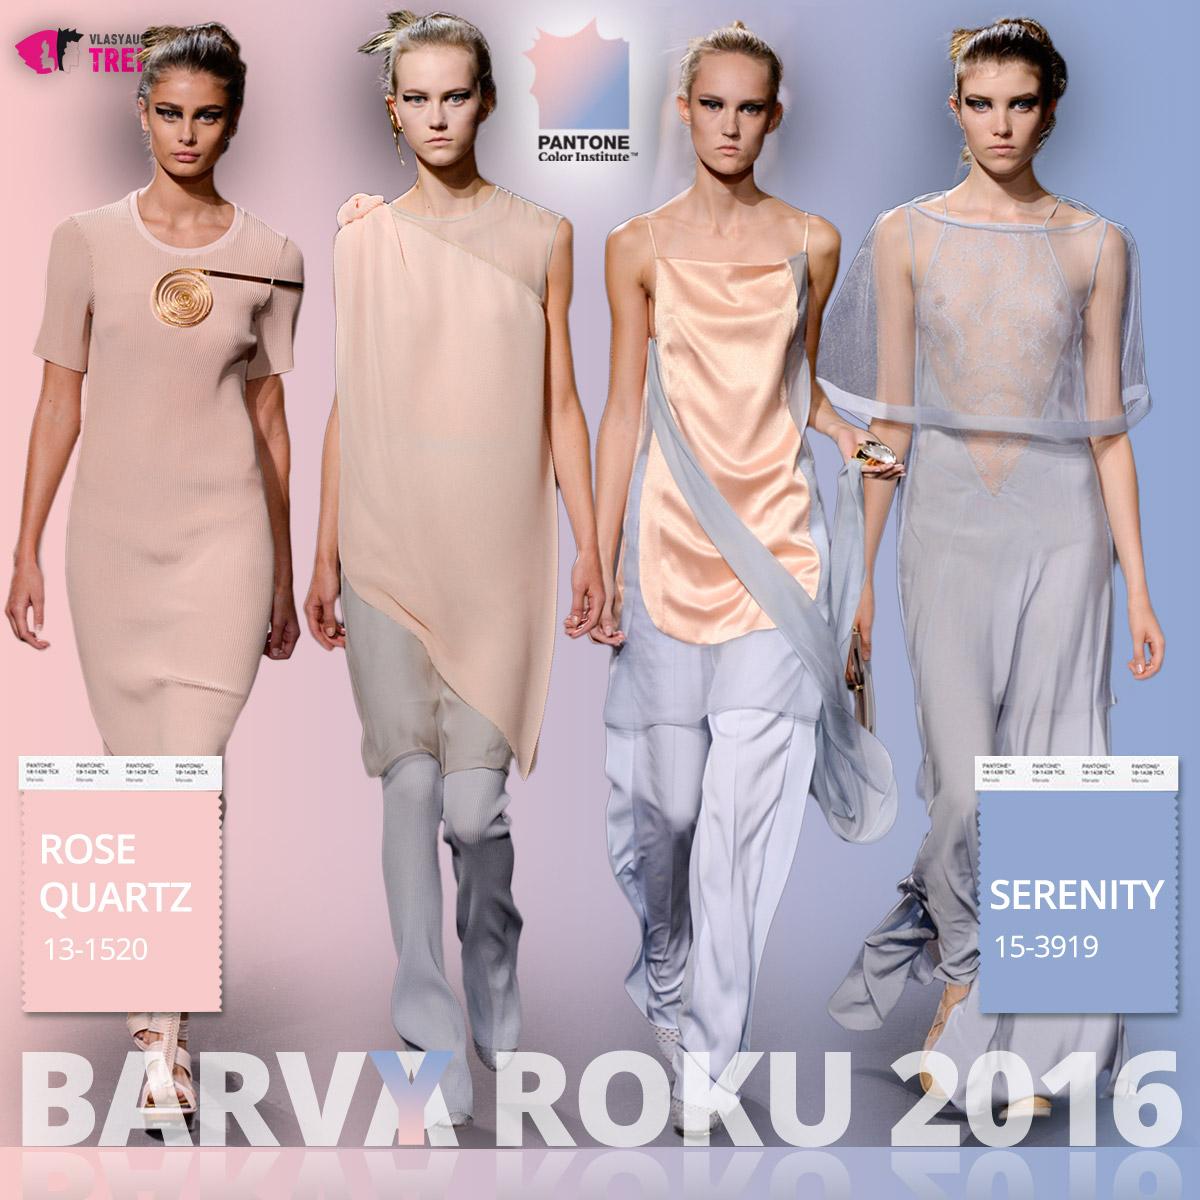 Barvy roku 2016 a móda Vionett – kolekce jaro/léto 2016.